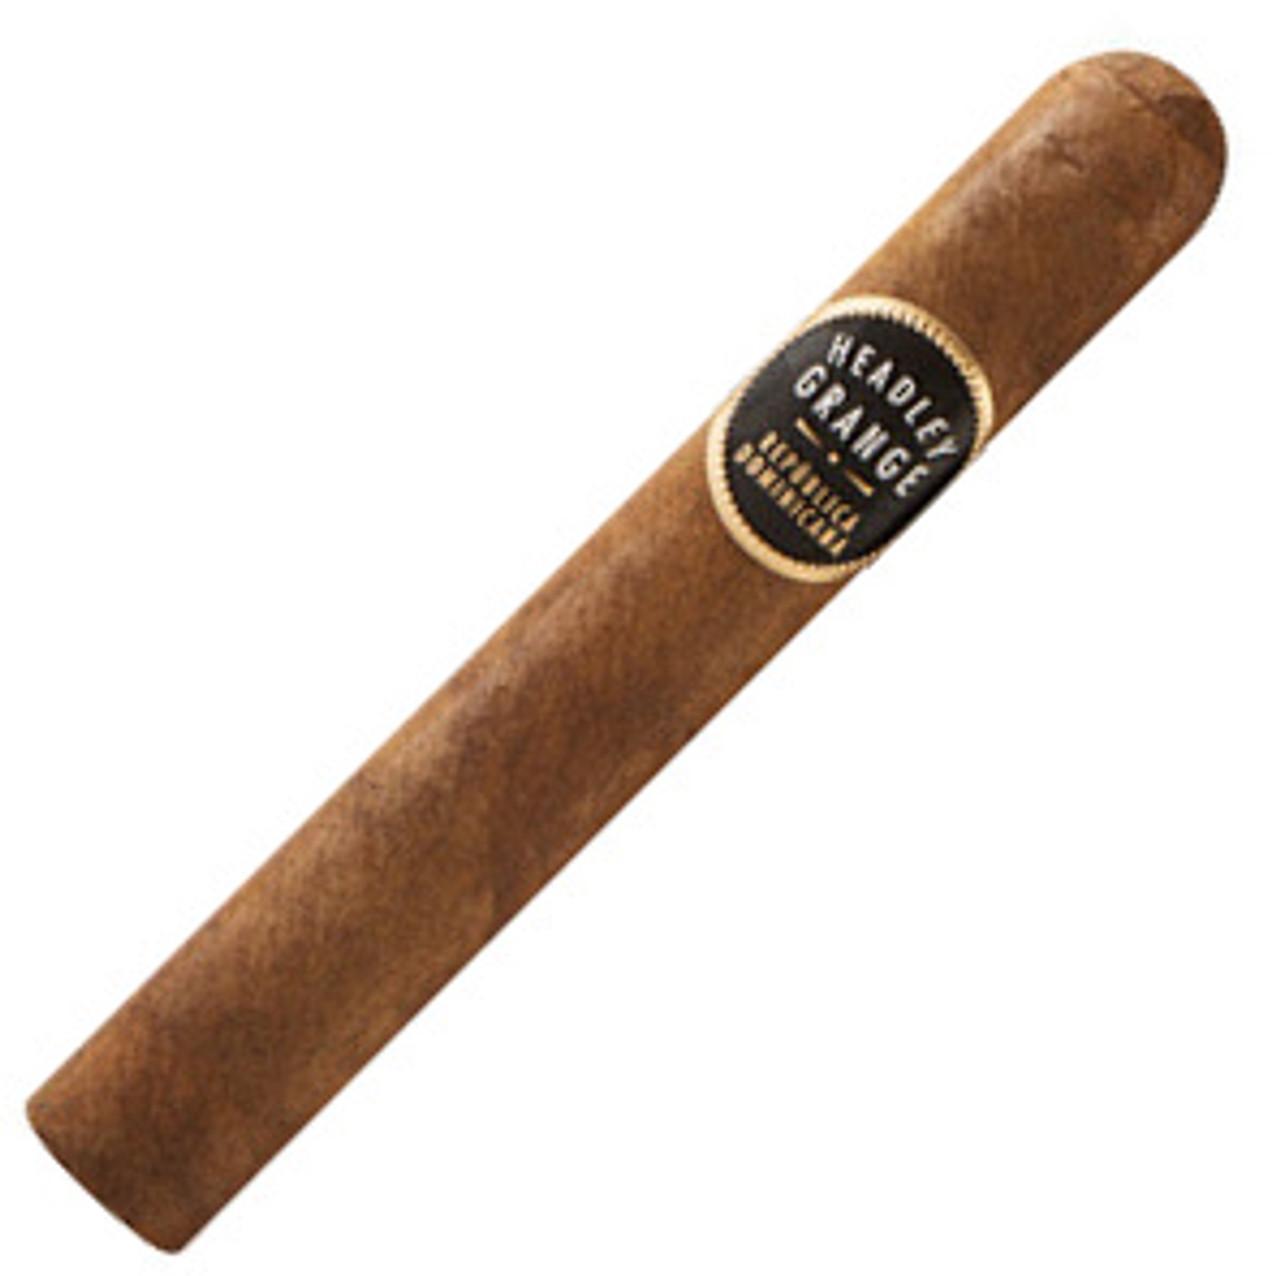 Headley Grange Hermoso No.4 Cigars - 5 x 48 (Box of 24)